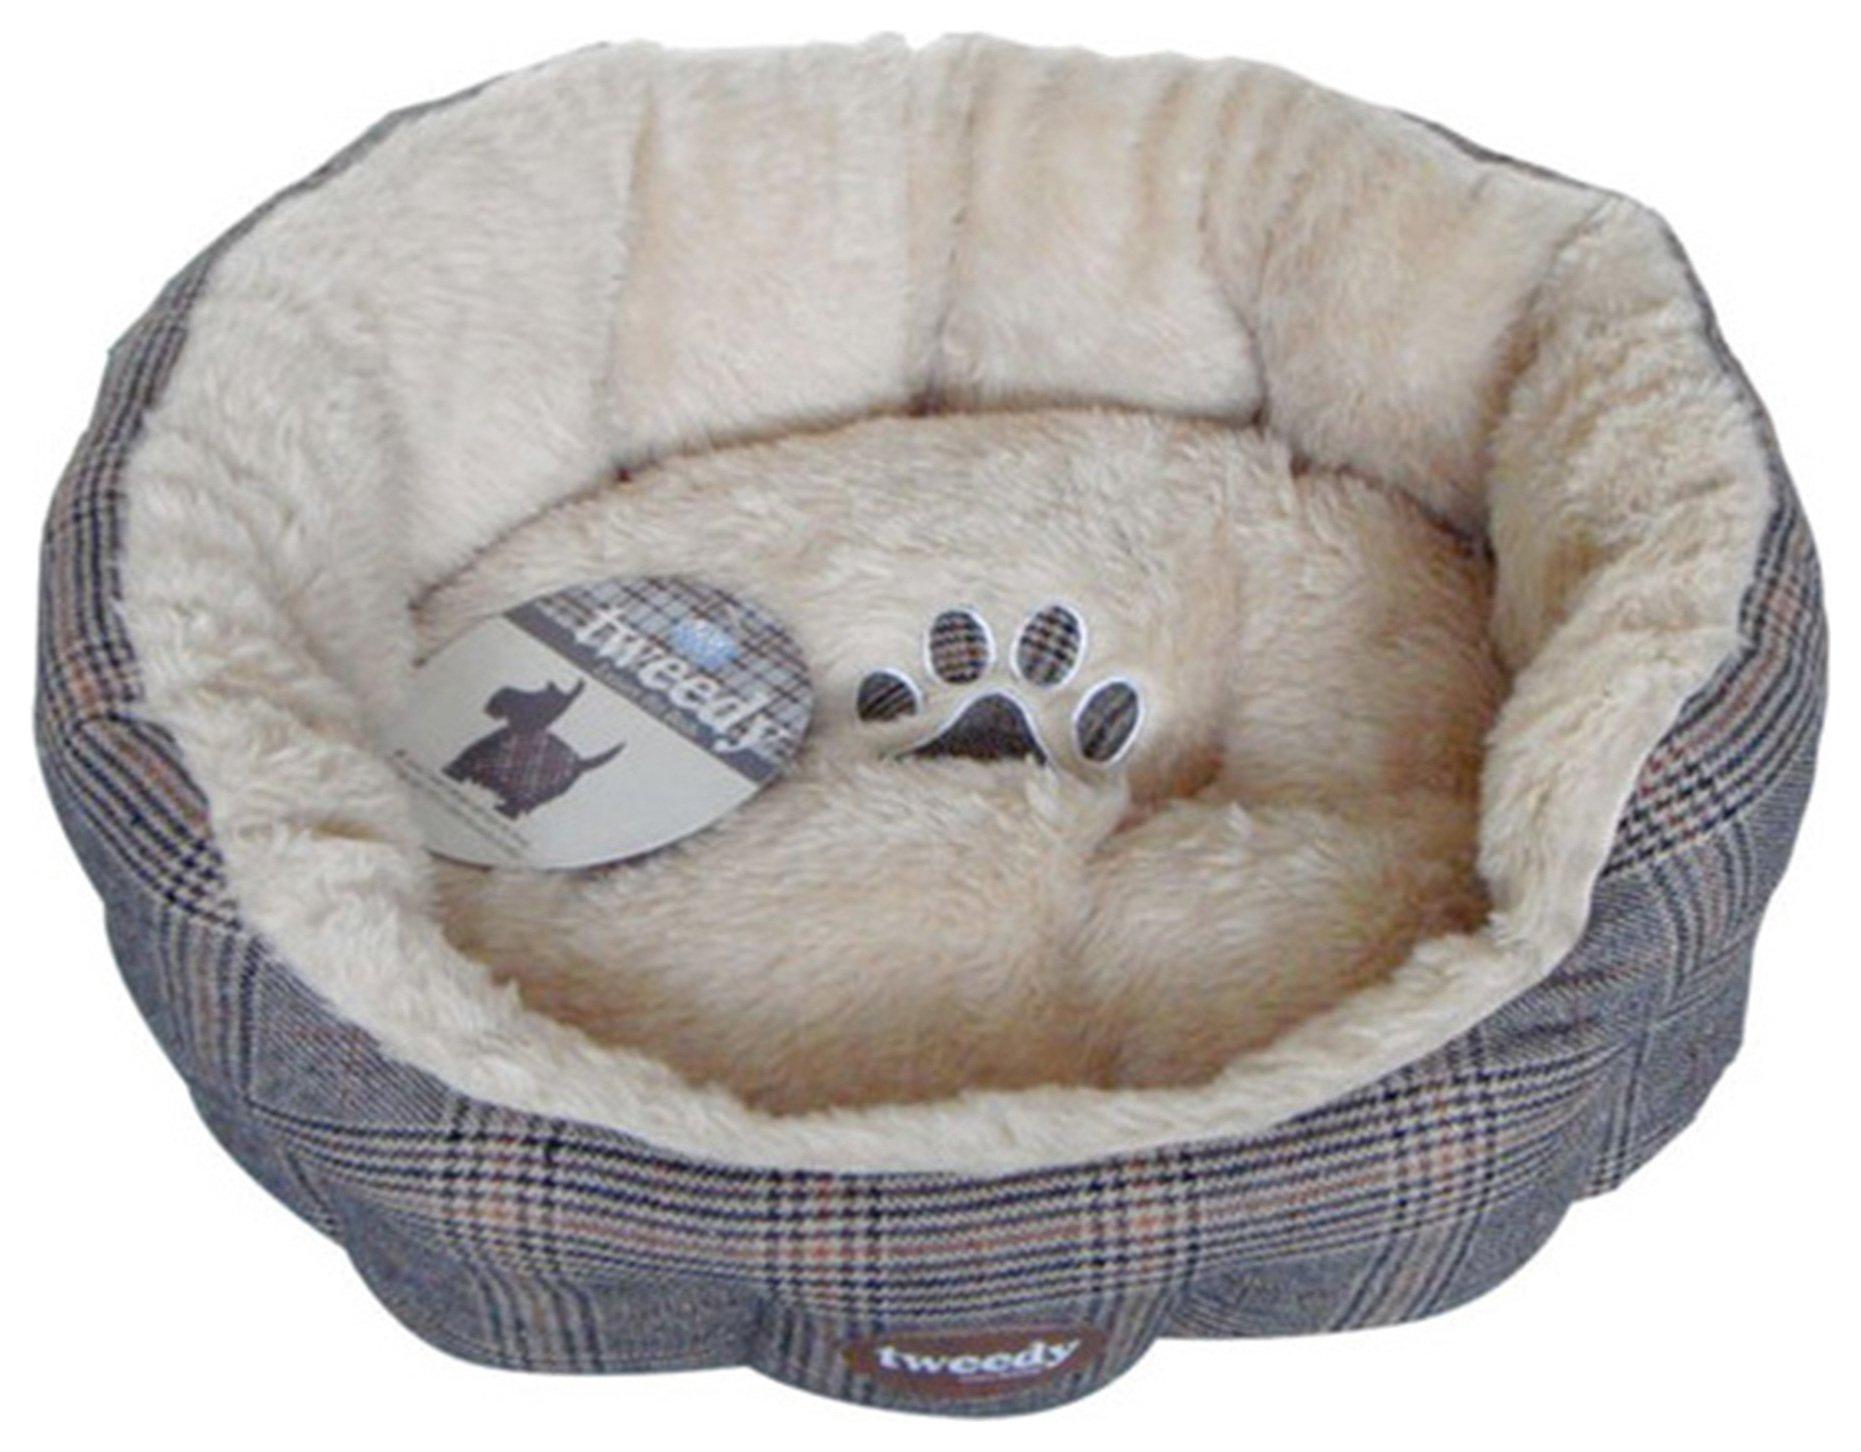 search results for pet brands tweedy medium 60 x 50 x 22cm sofa bed. Black Bedroom Furniture Sets. Home Design Ideas